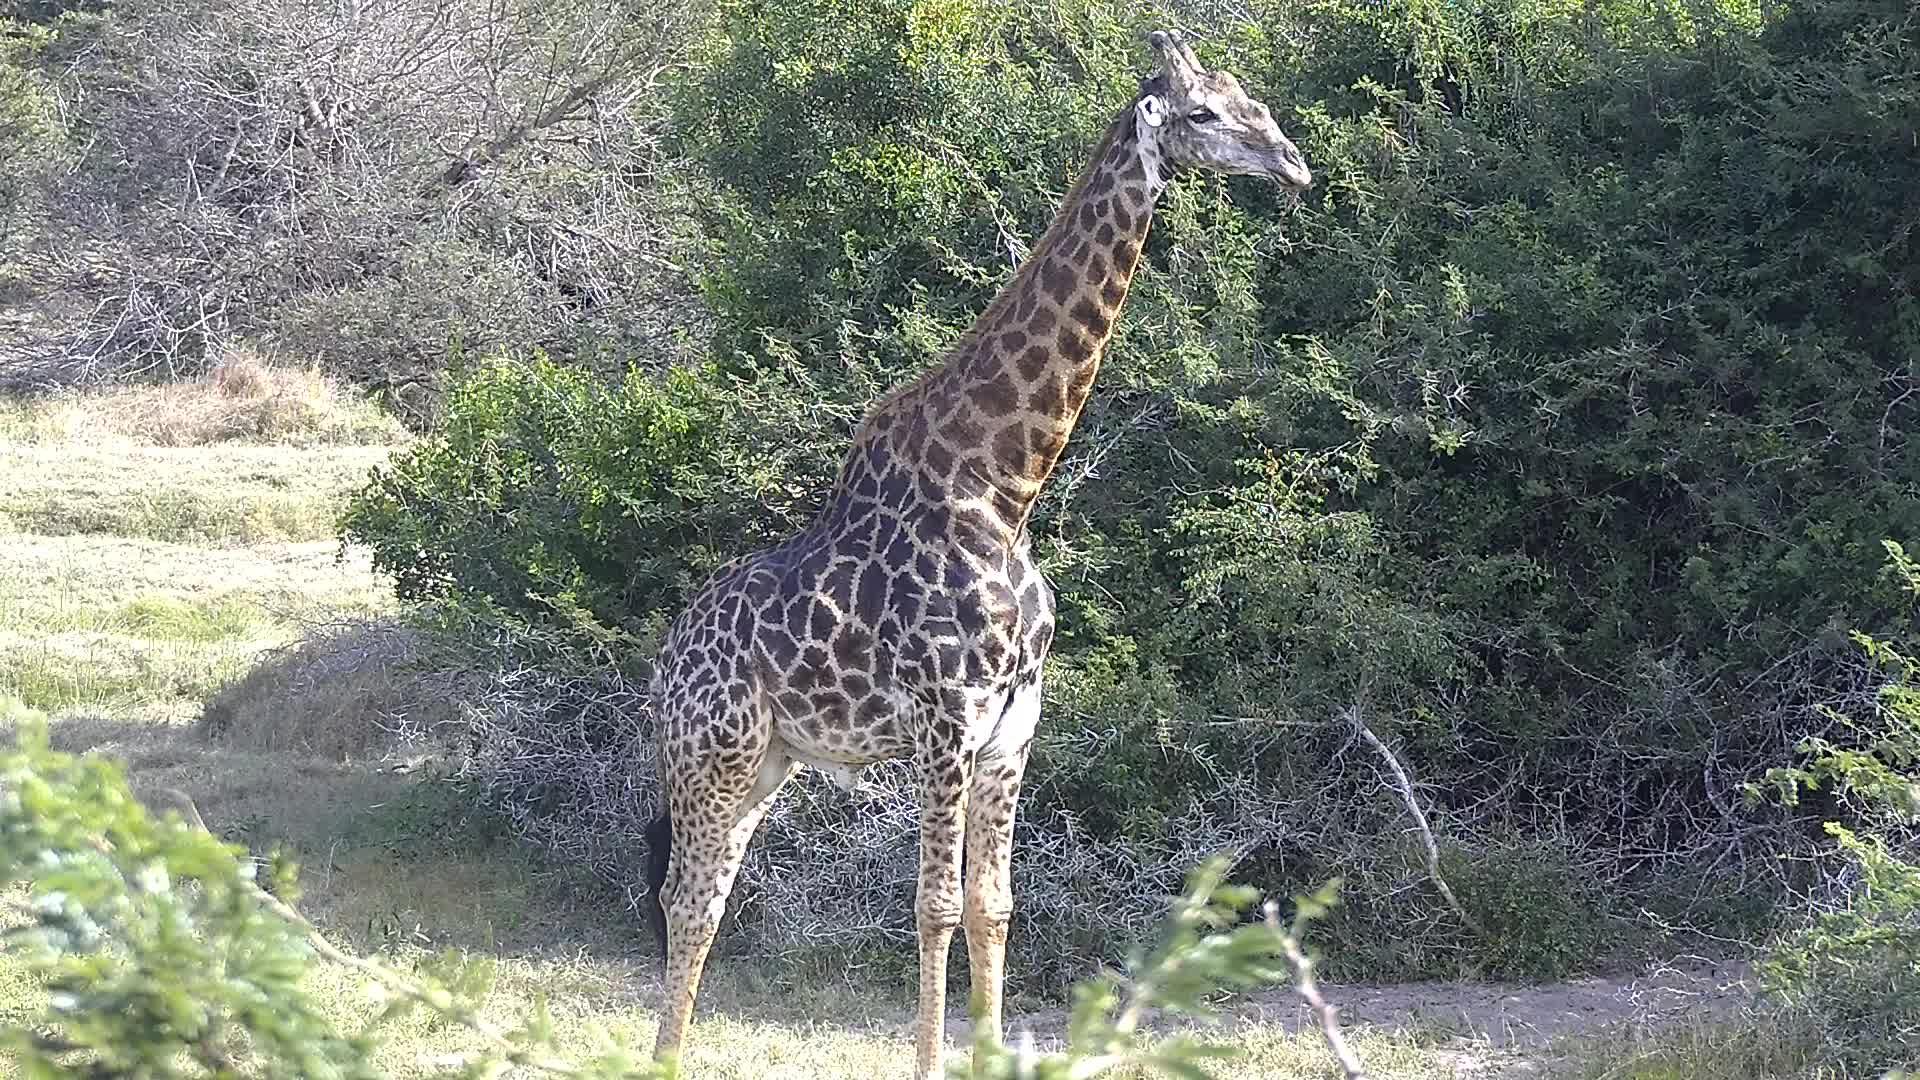 VIDEO: Male Giraffe wondering what to do next